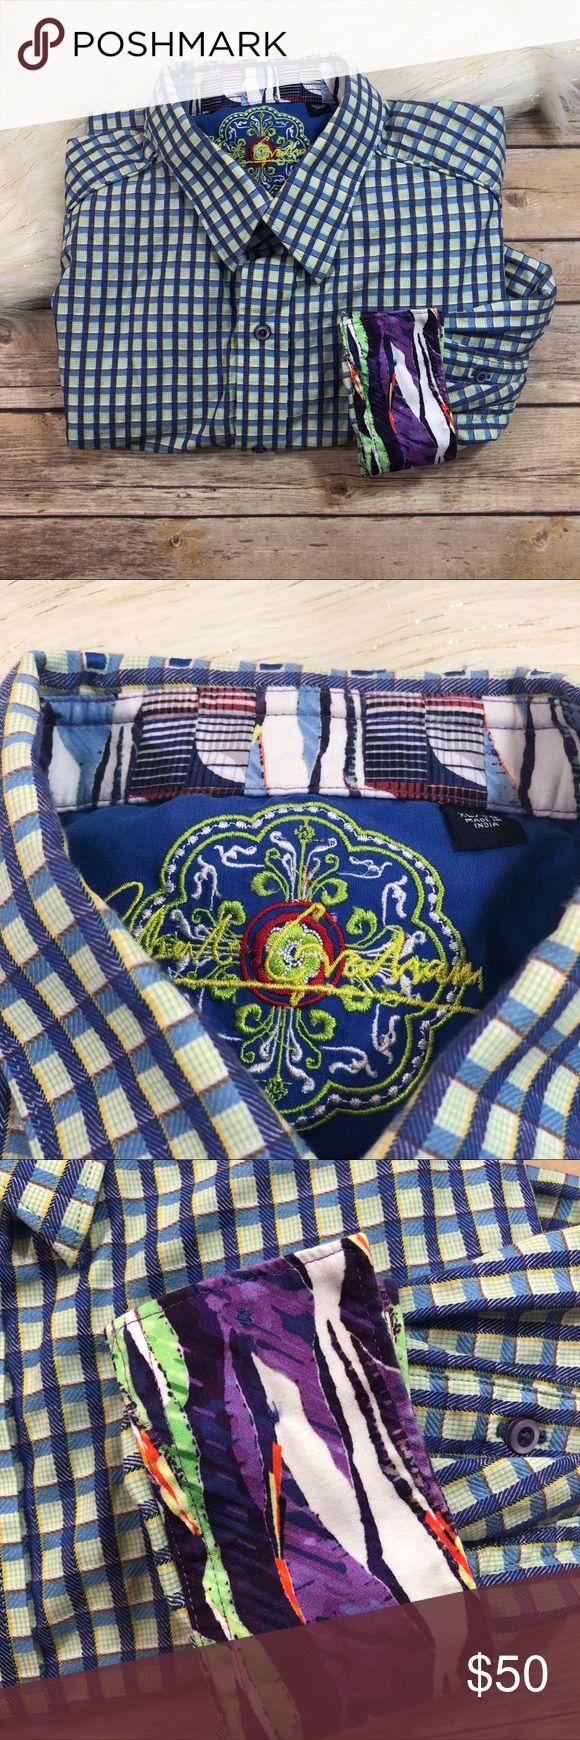 "Robert Graham Plaid & Checks Button Up Dress Shirt Robert Graham Plaid and Checks Button Up Dress Shirt Size XL Size XL Length- 34"" 100% Cotton Smoke free home! Robert Graham Shirts Dress Shirts"